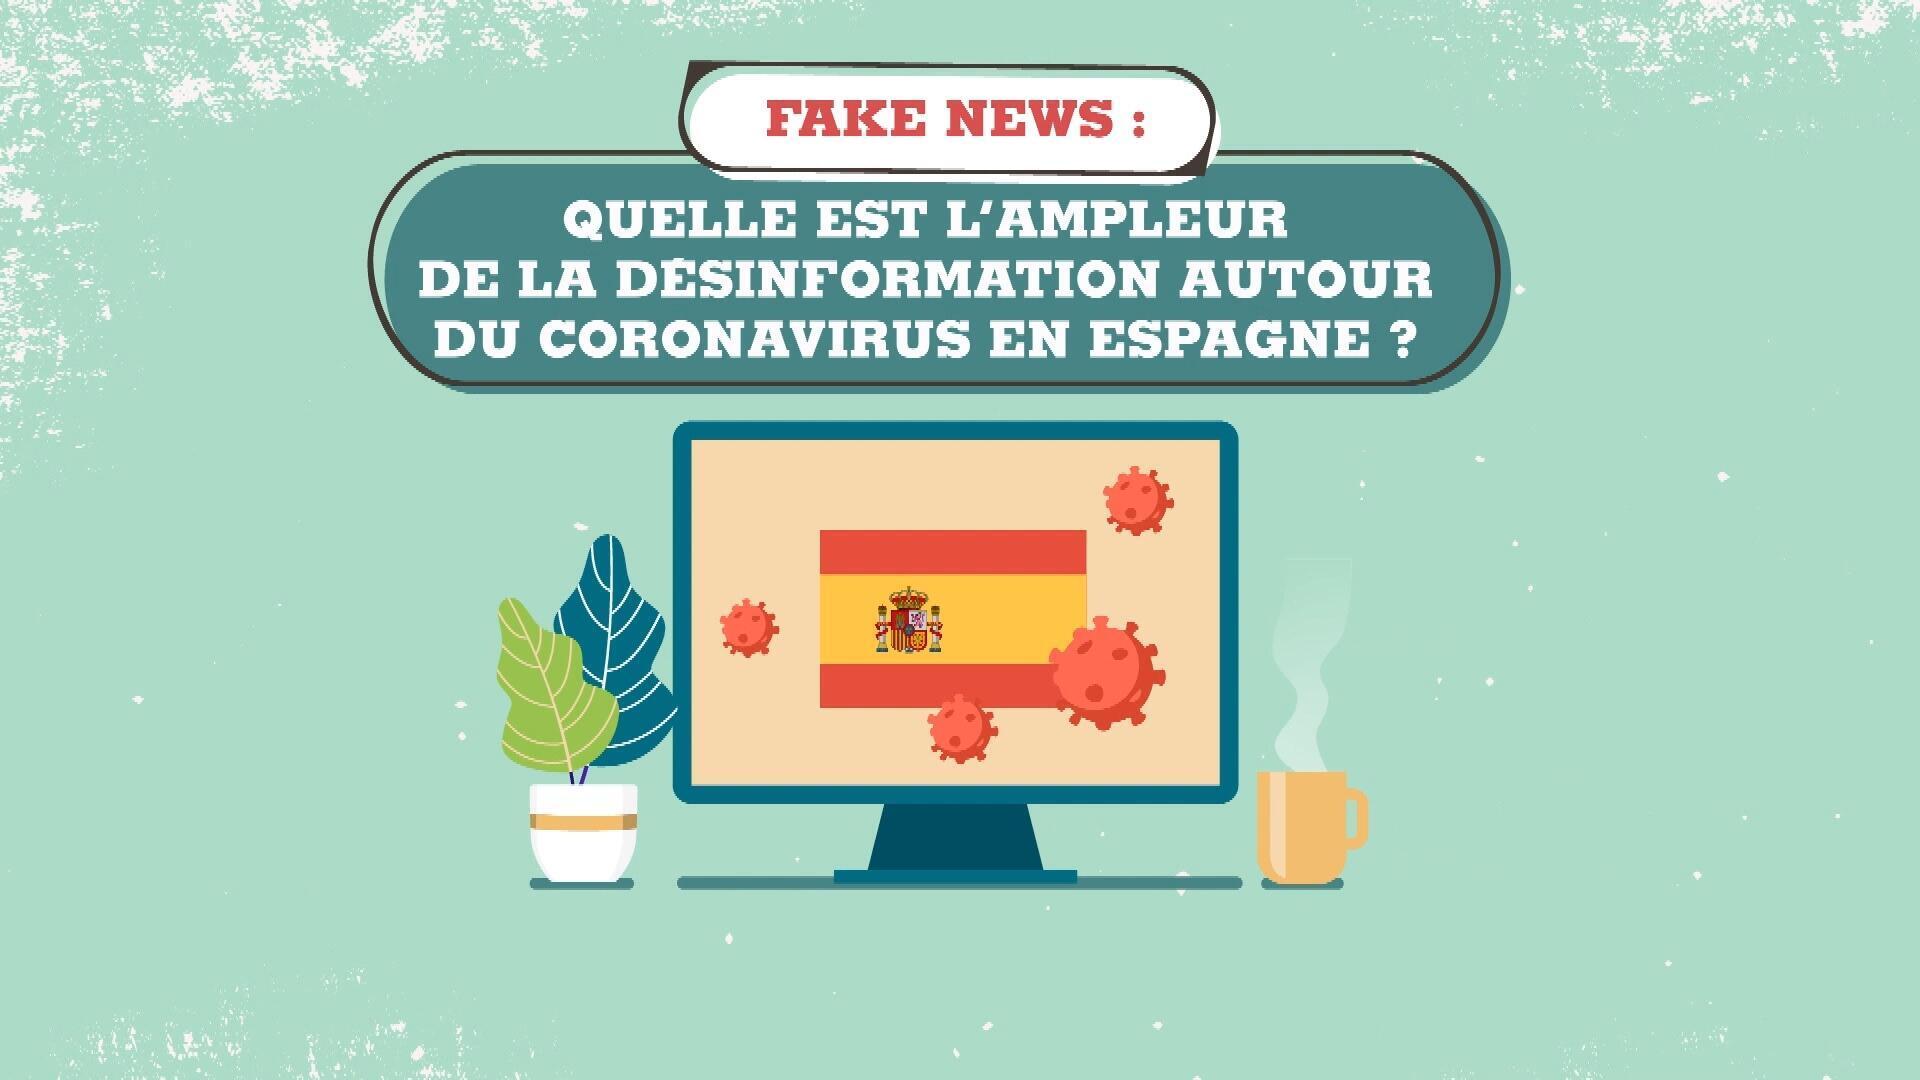 2021-07-15 13:07 FR WB ICI L EUROPE FAKE NEWS BALEARES DESINFORMATION